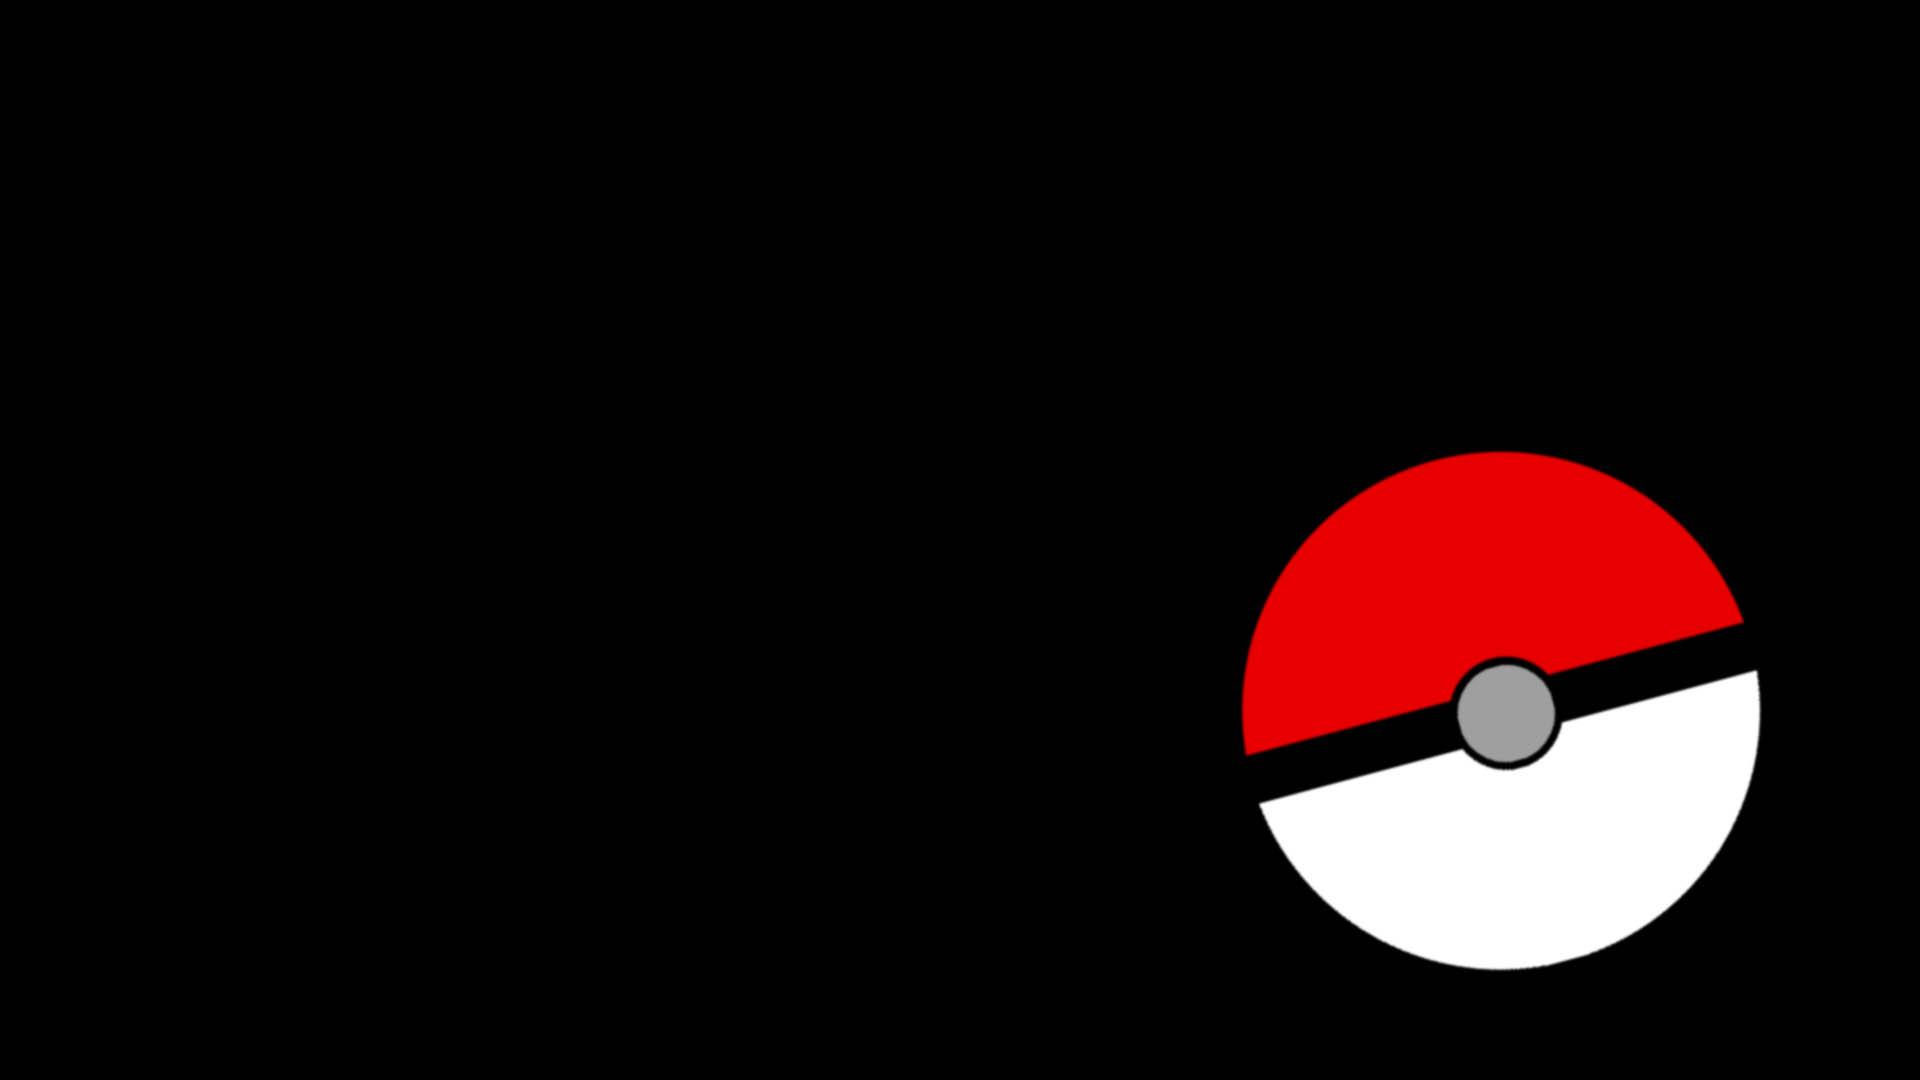 Pokemon, Poke Balls, black background